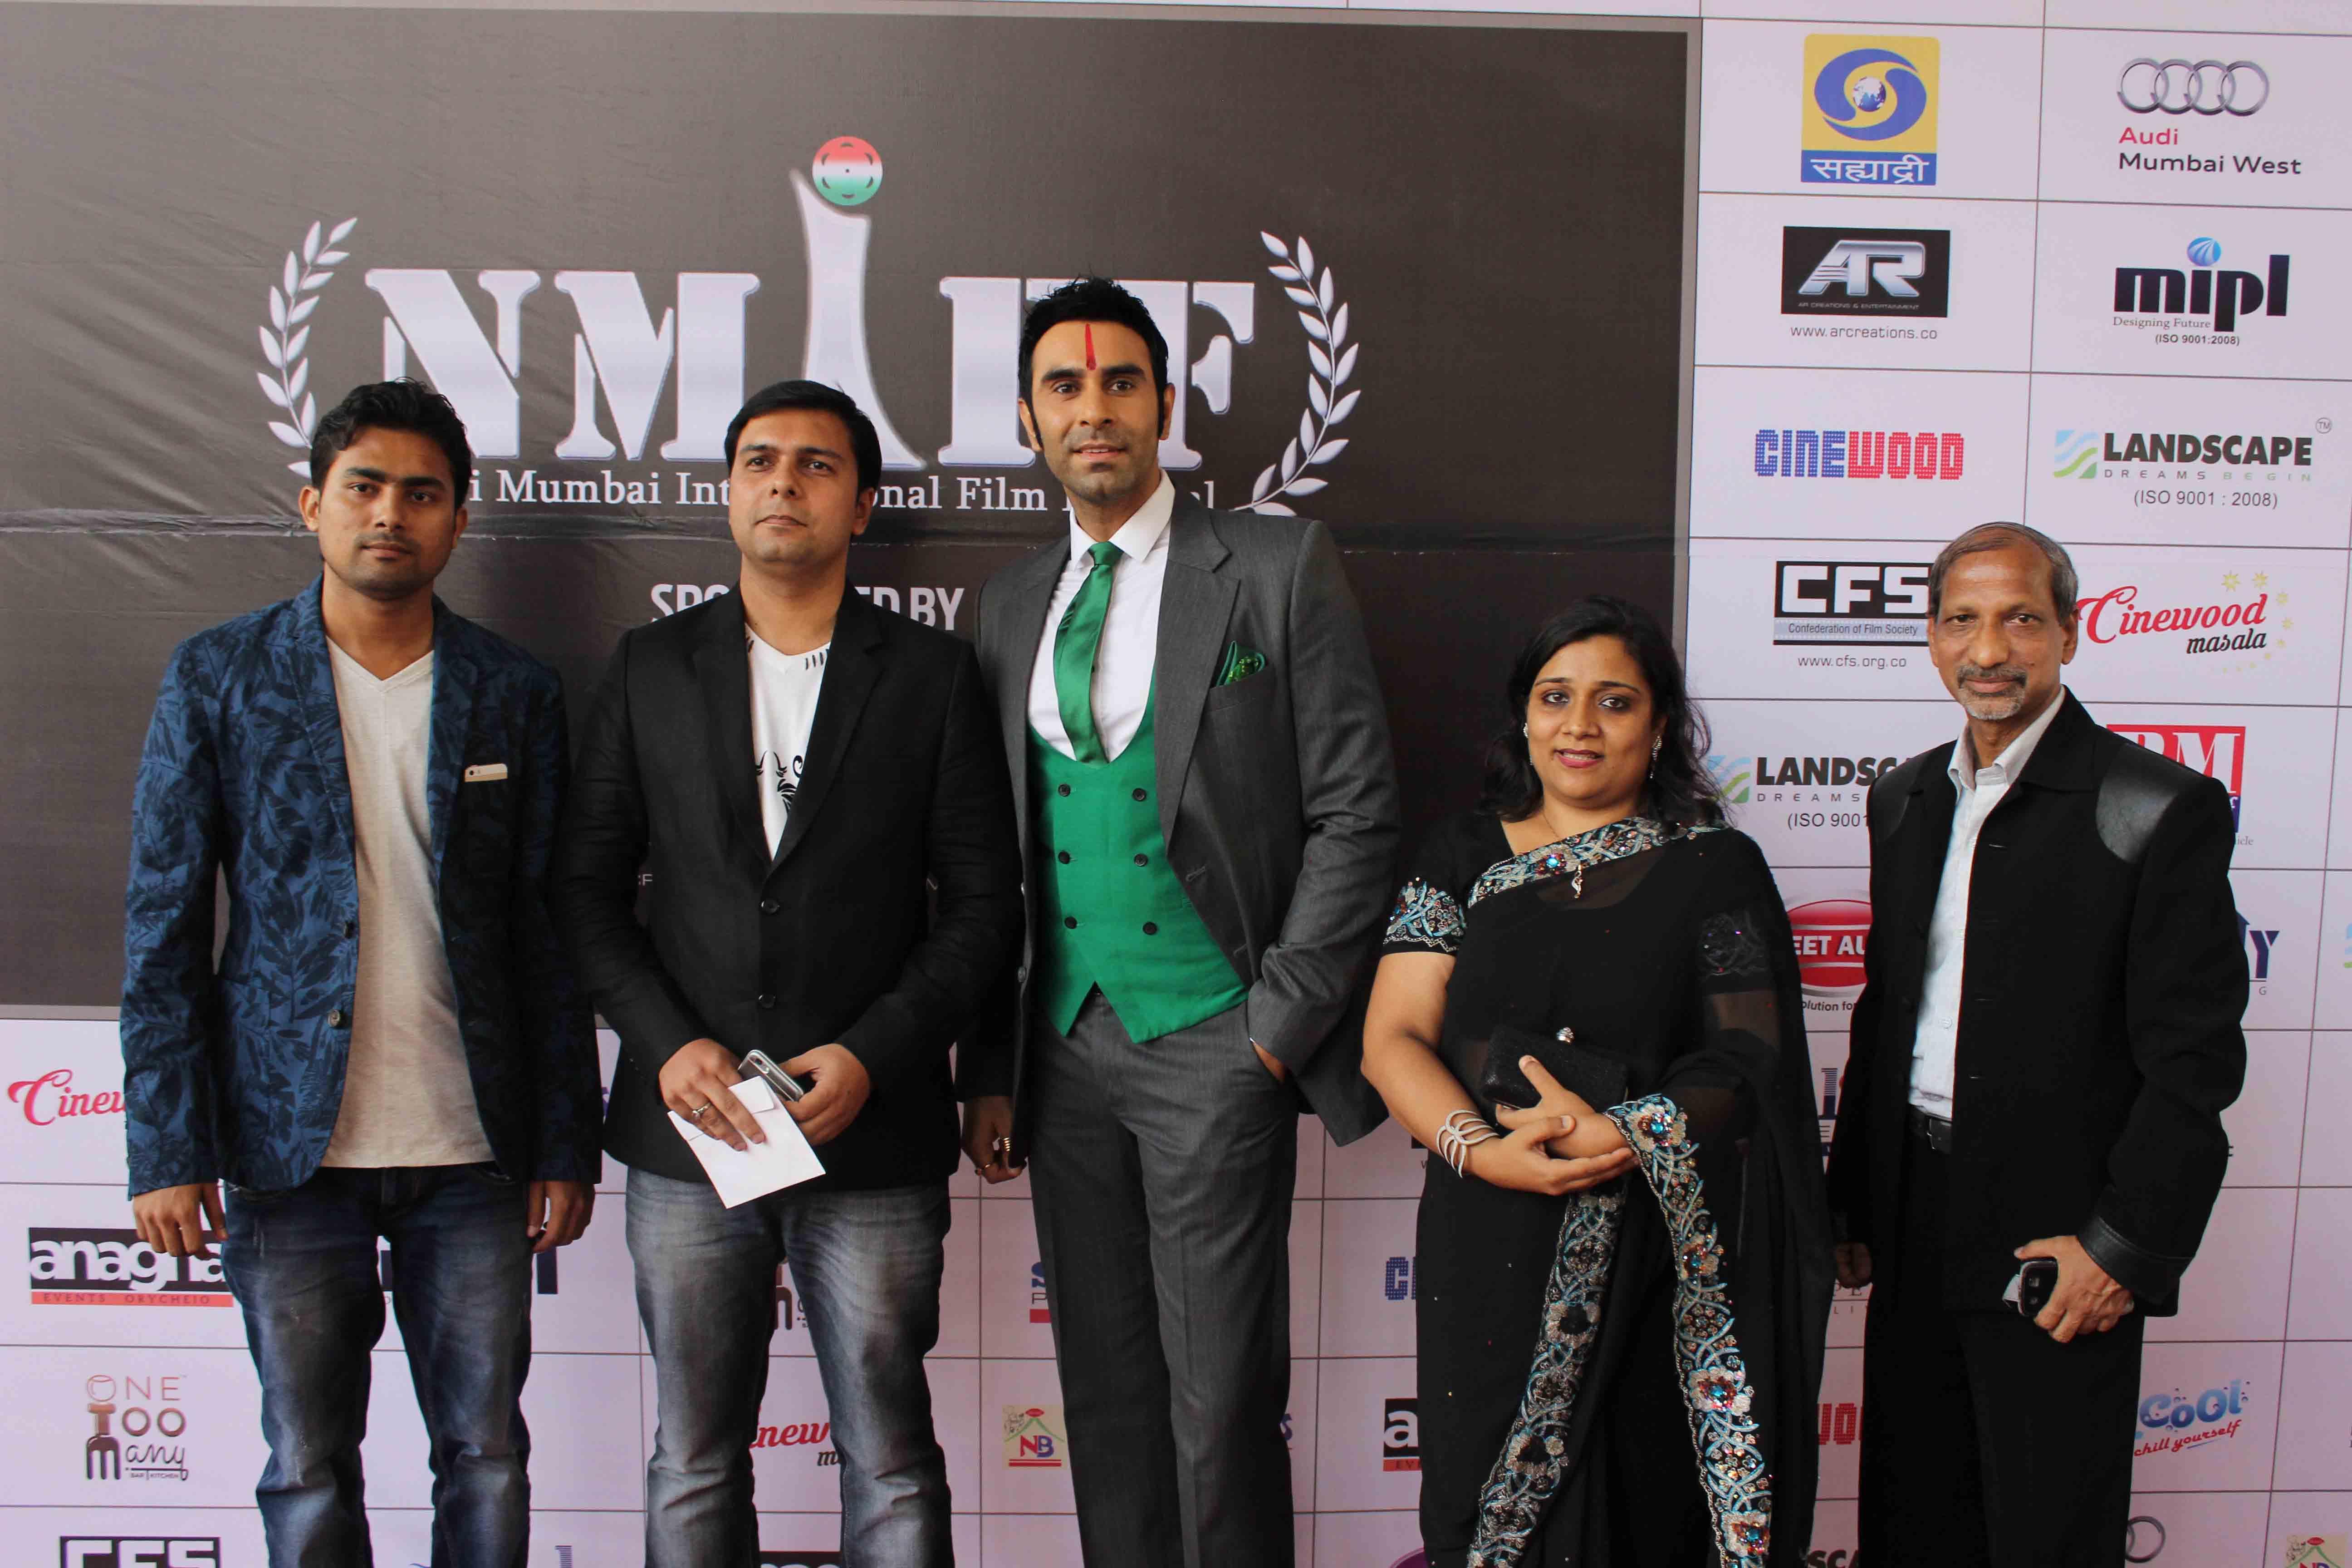 Sandip Soparrkar awarded by Navi Mumbai International Film Festival1.docx